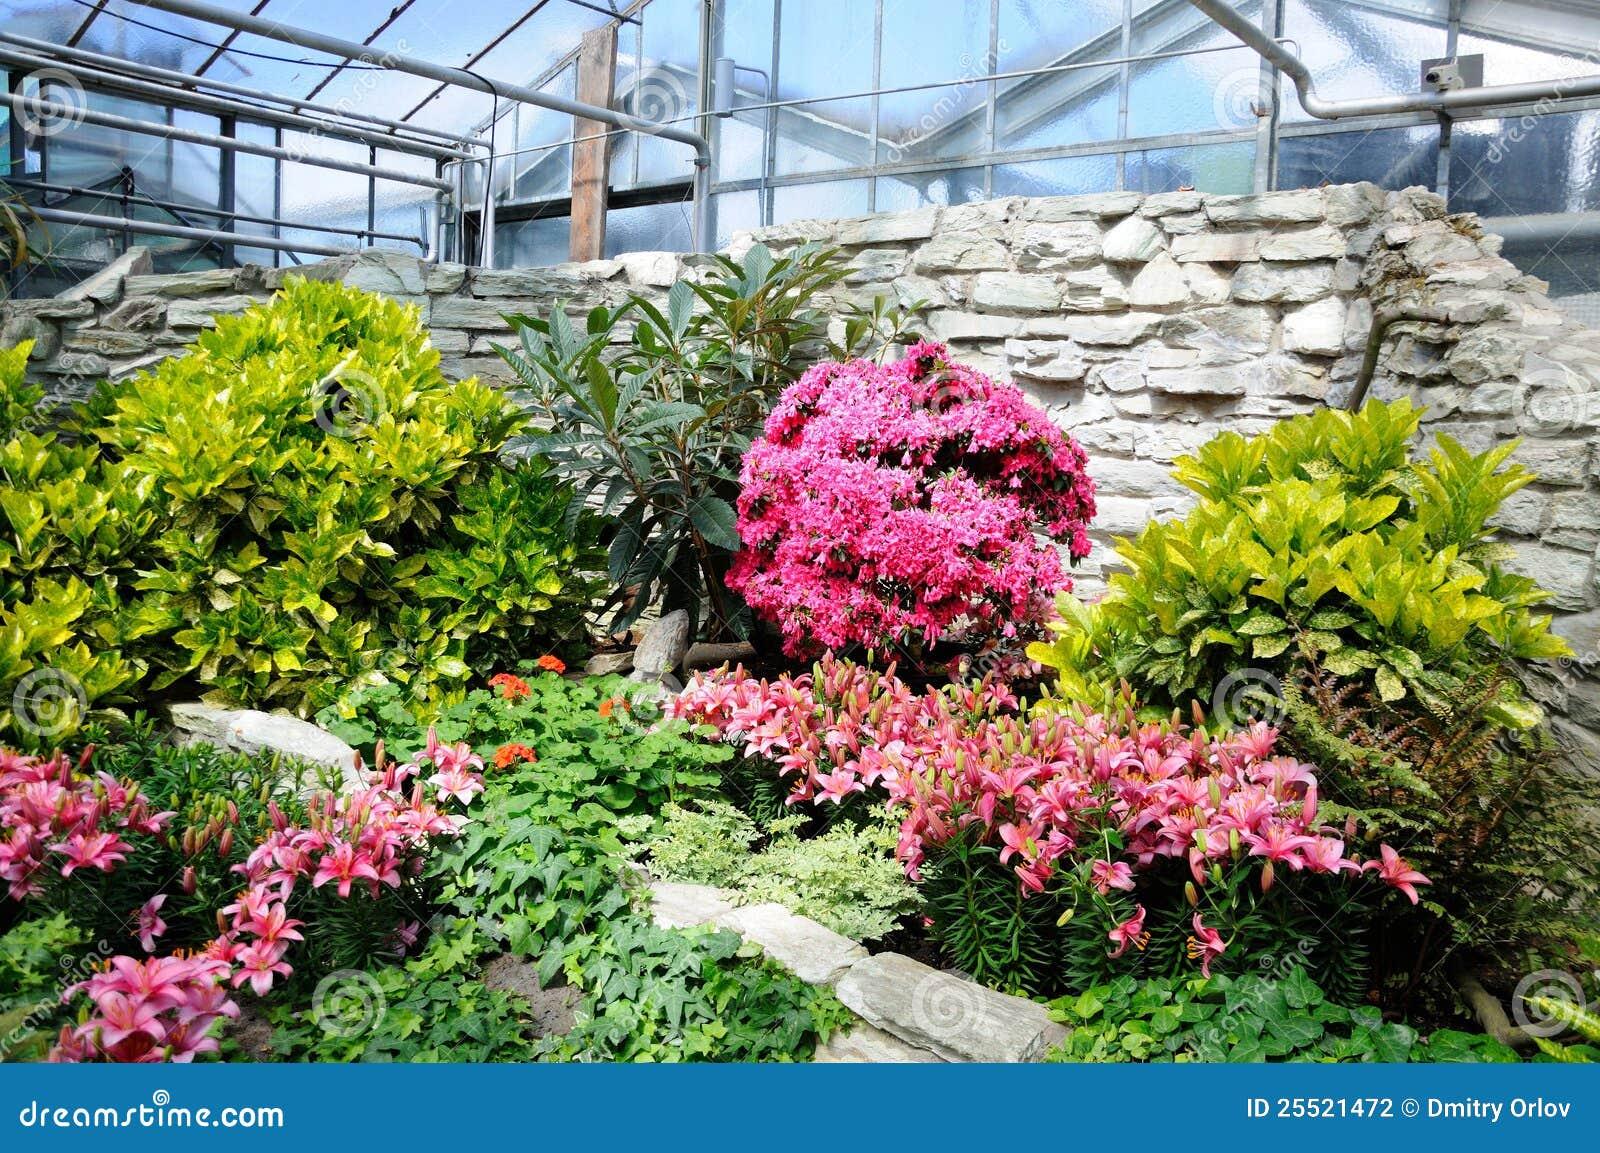 garten frankfurt, pink flowers in palmen garten, frankfurt am main, hessen, german, Design ideen